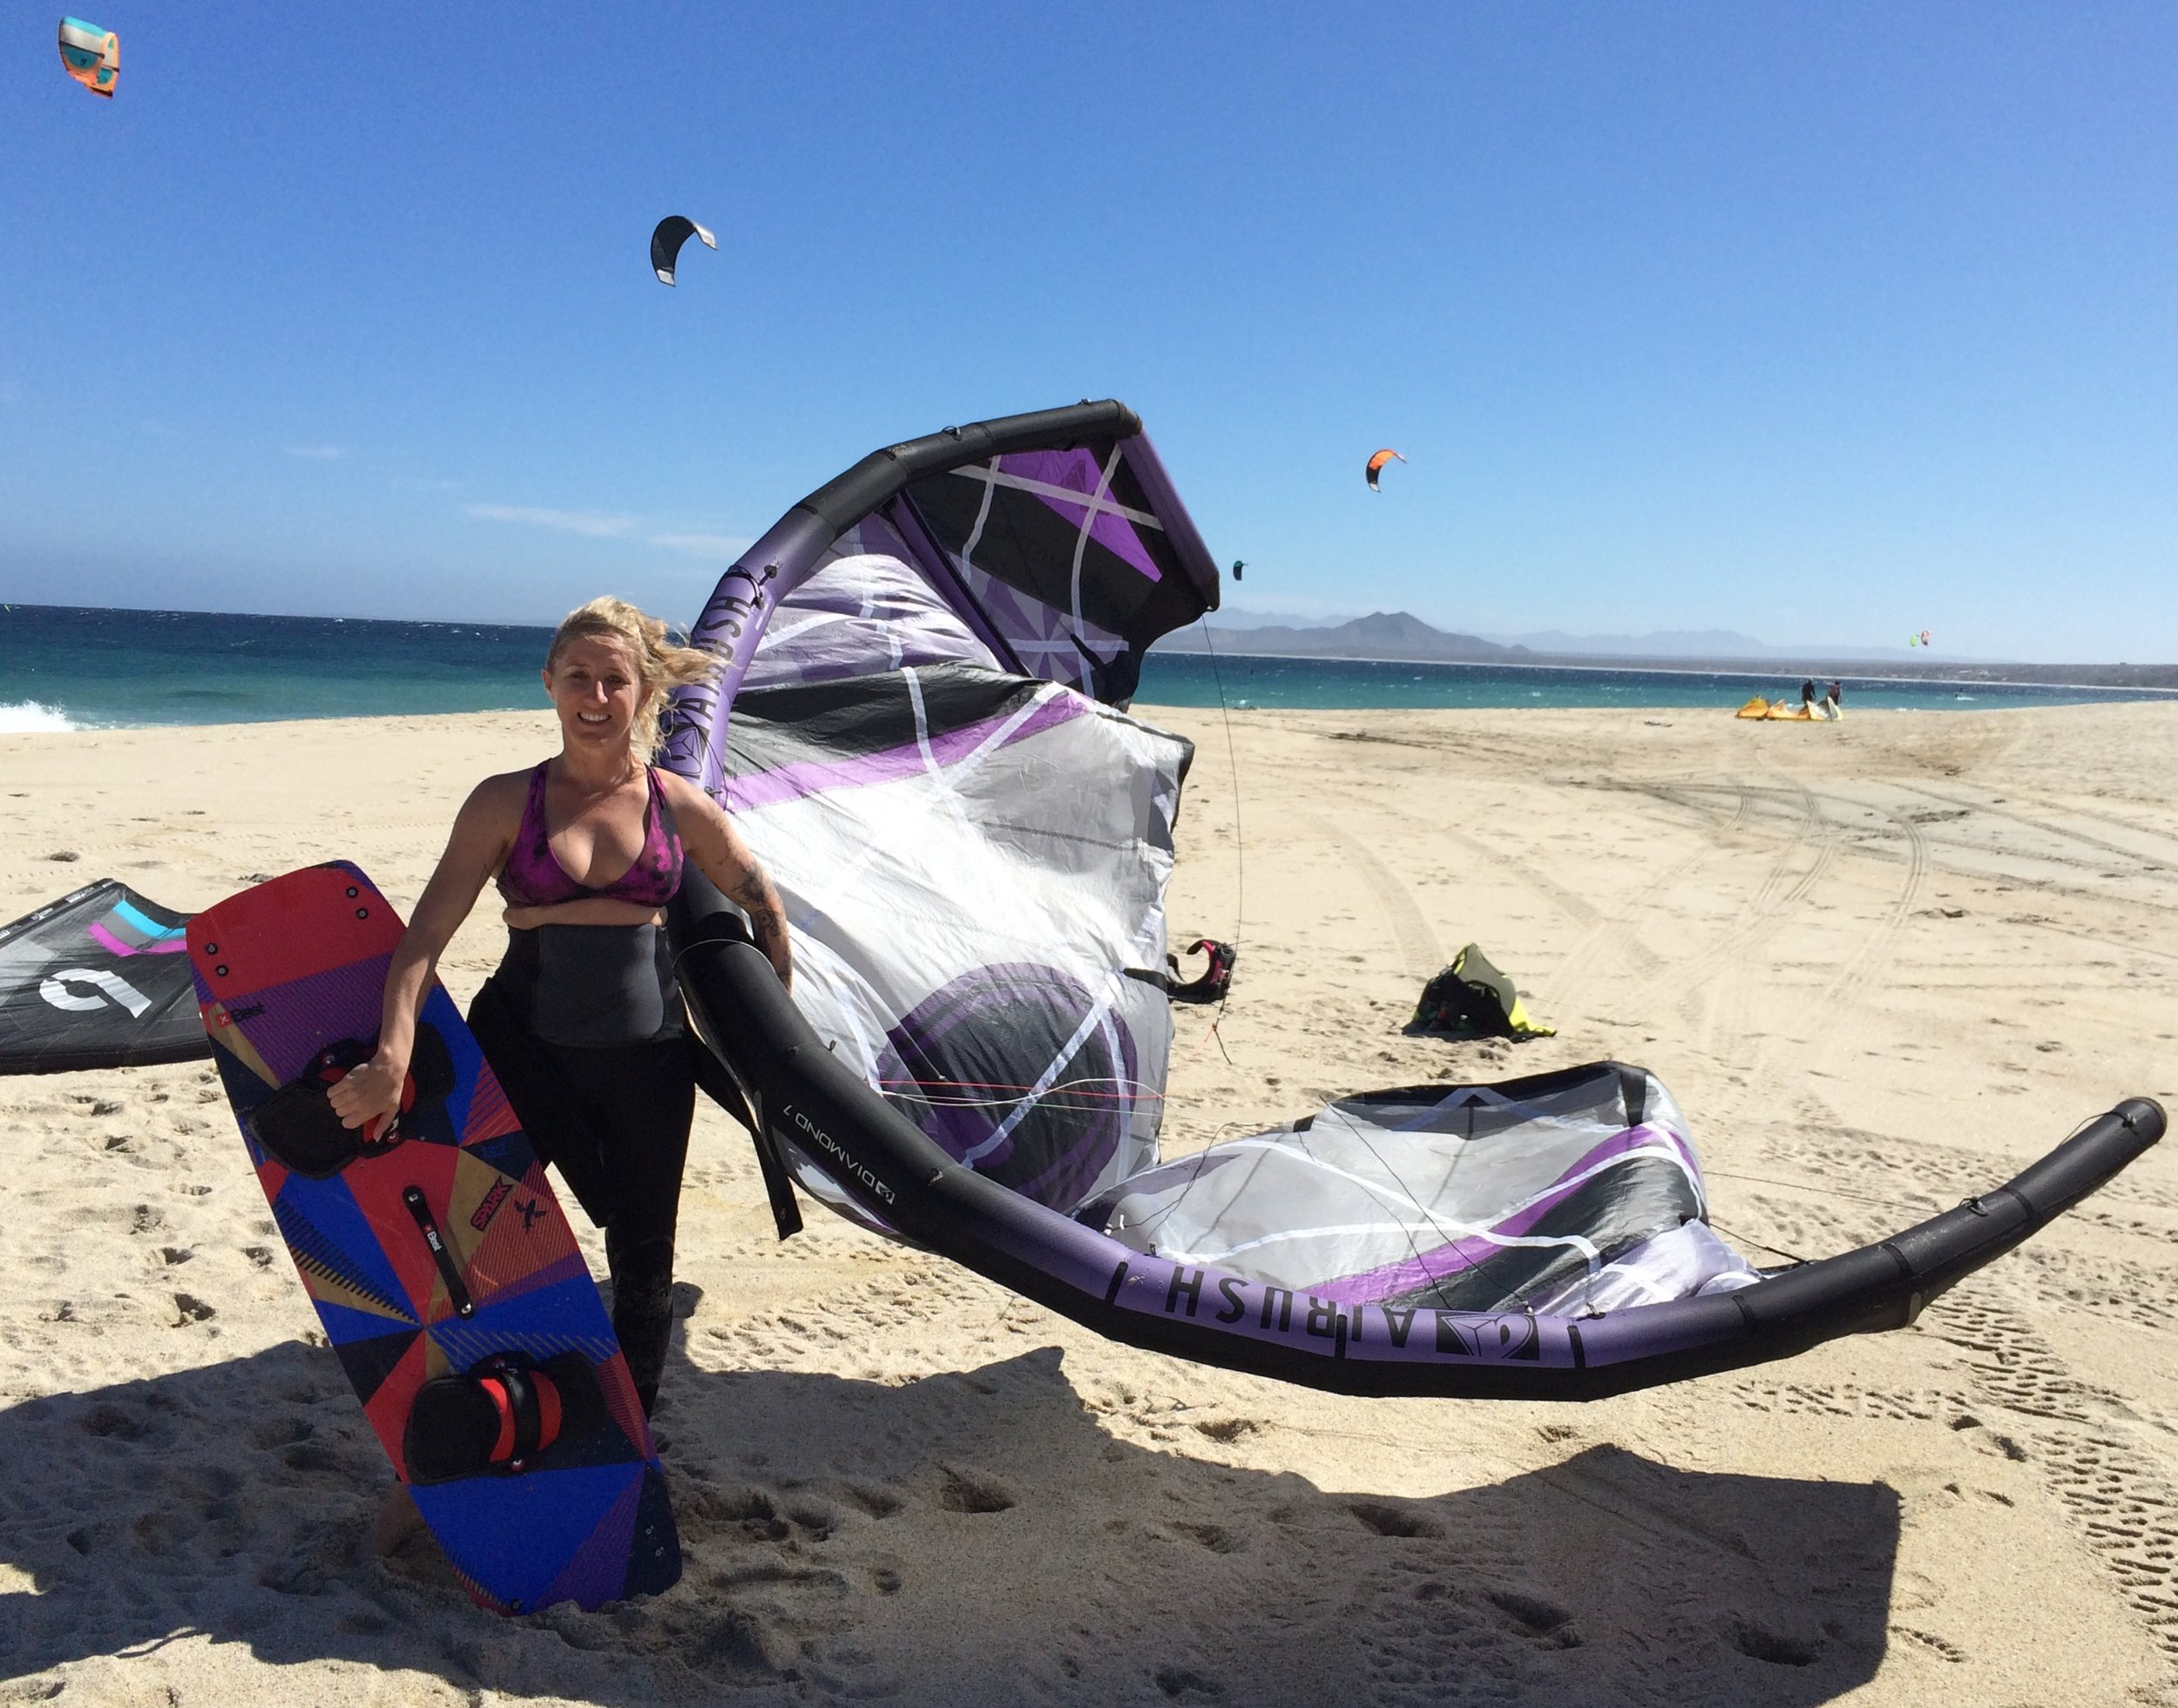 Kite surfing in Los Barriles, Baja, Mexico